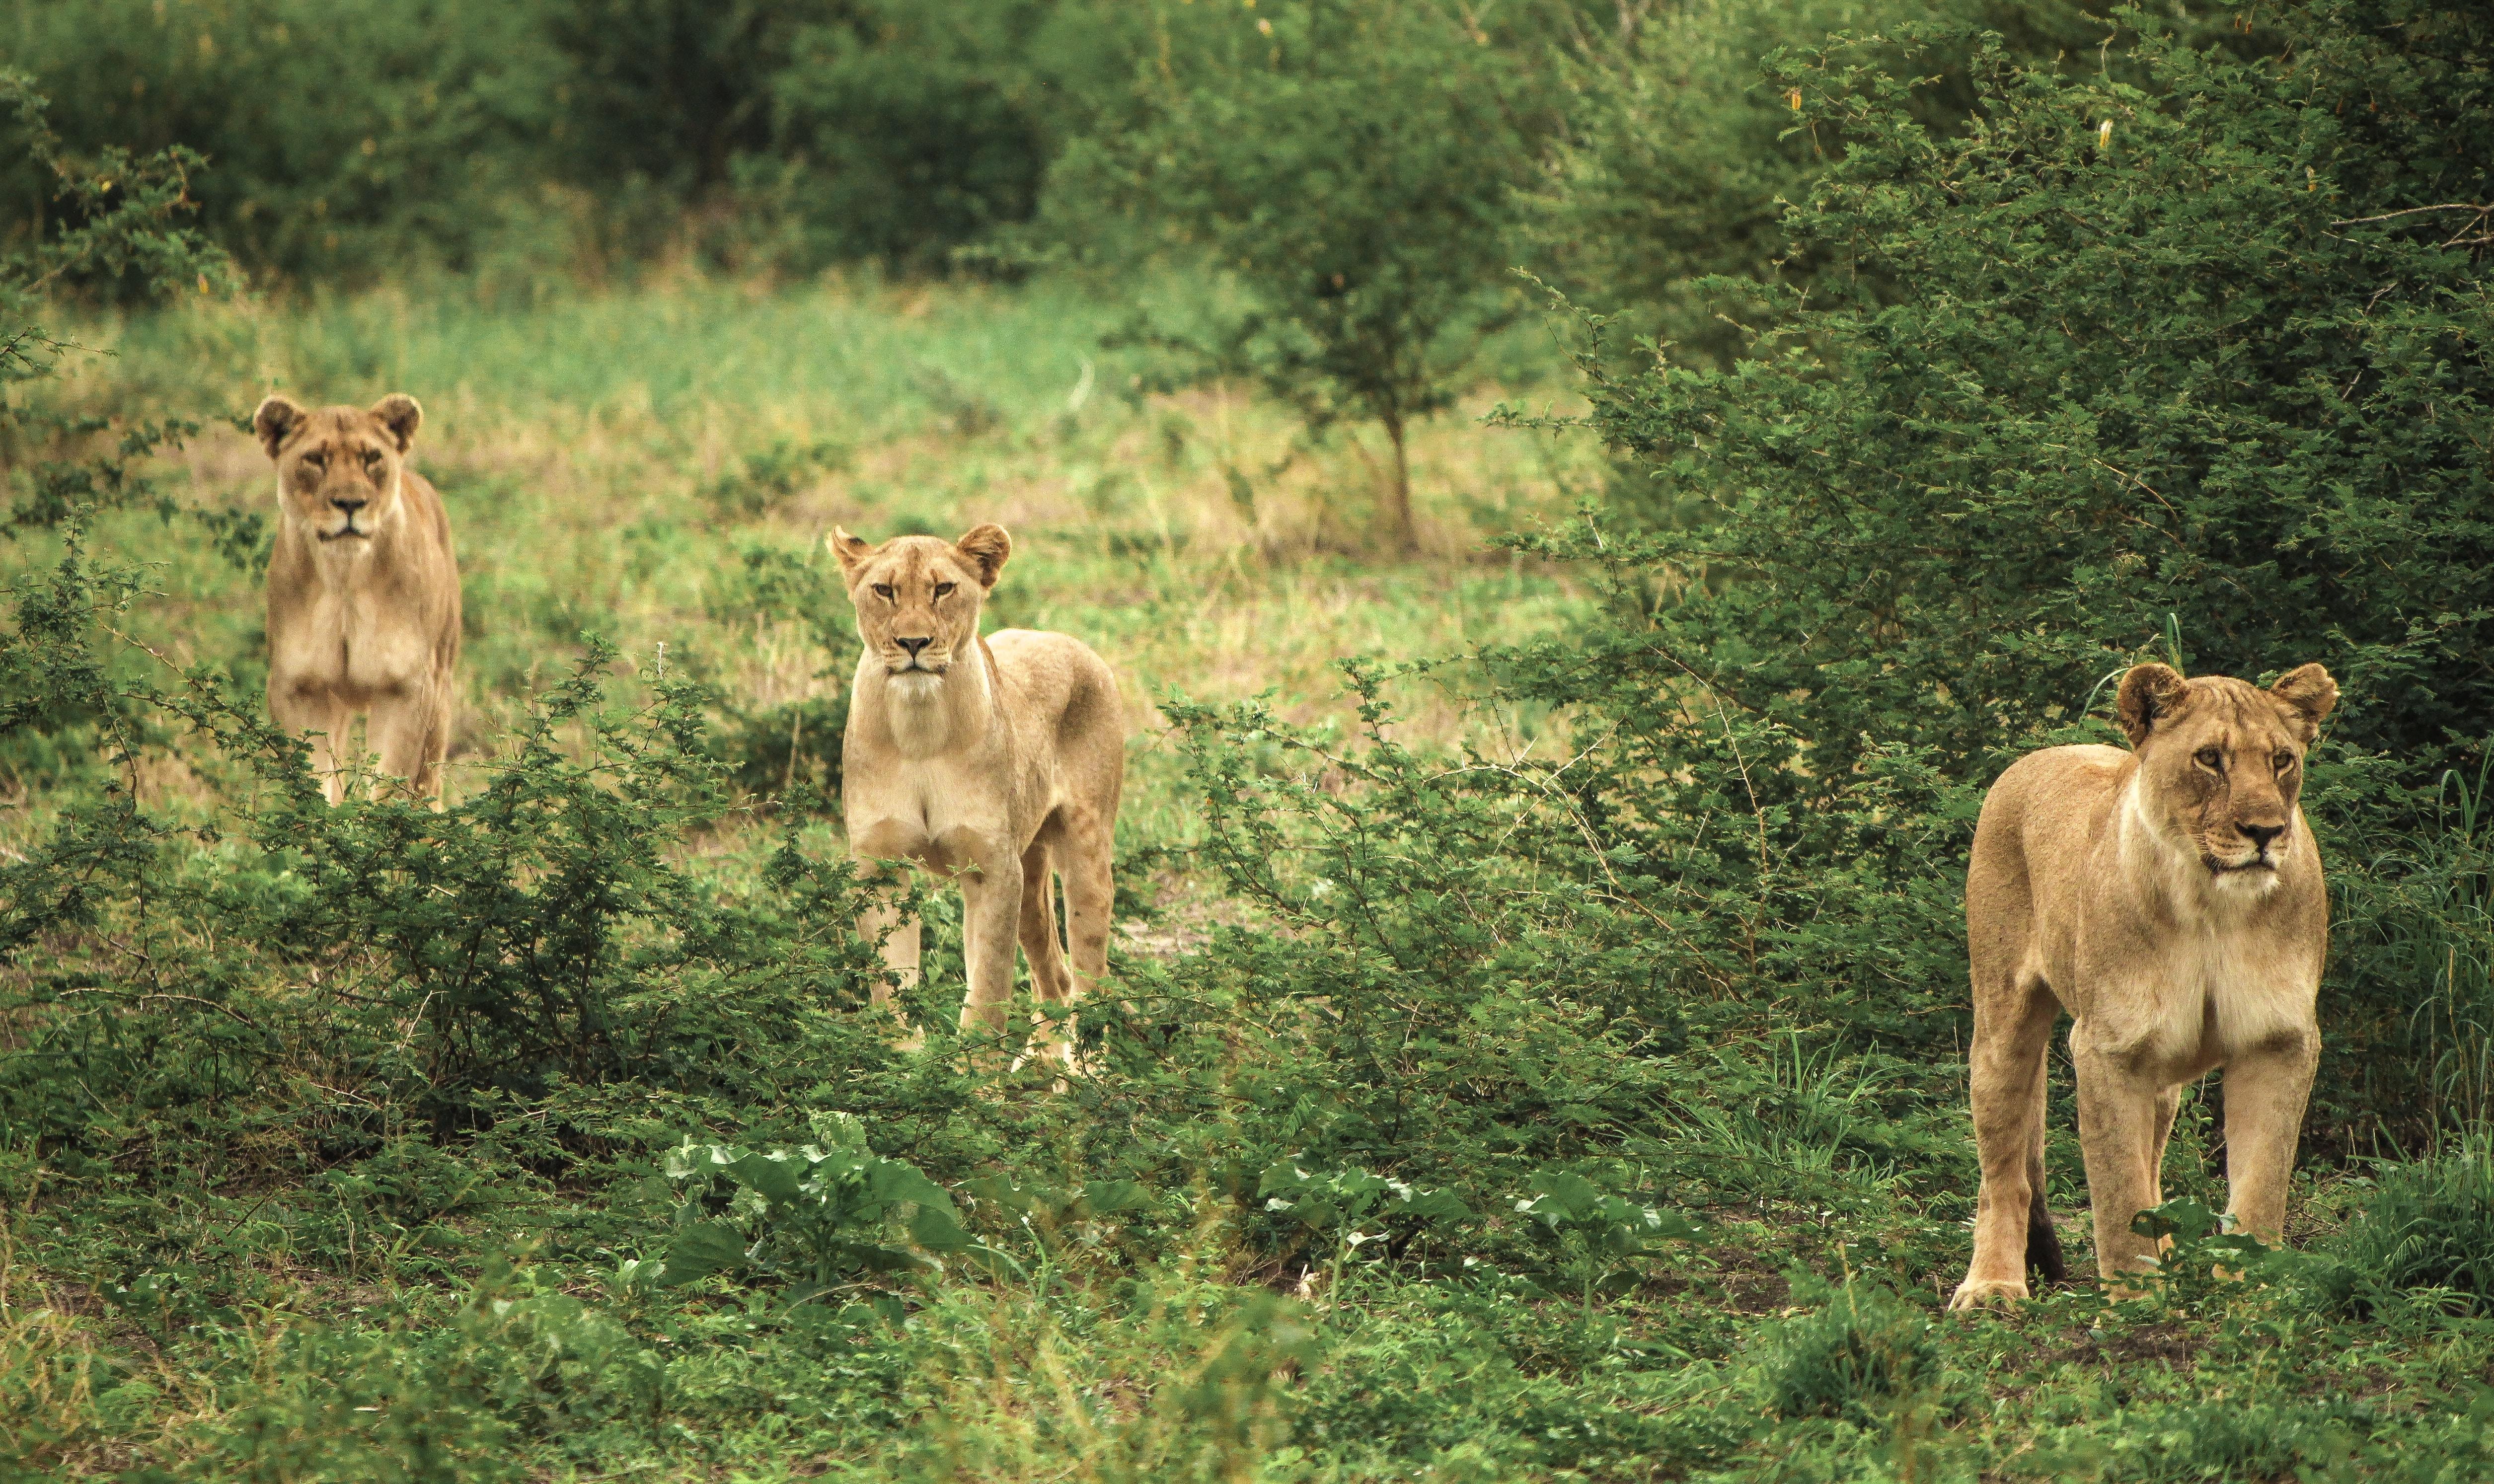 three cougars